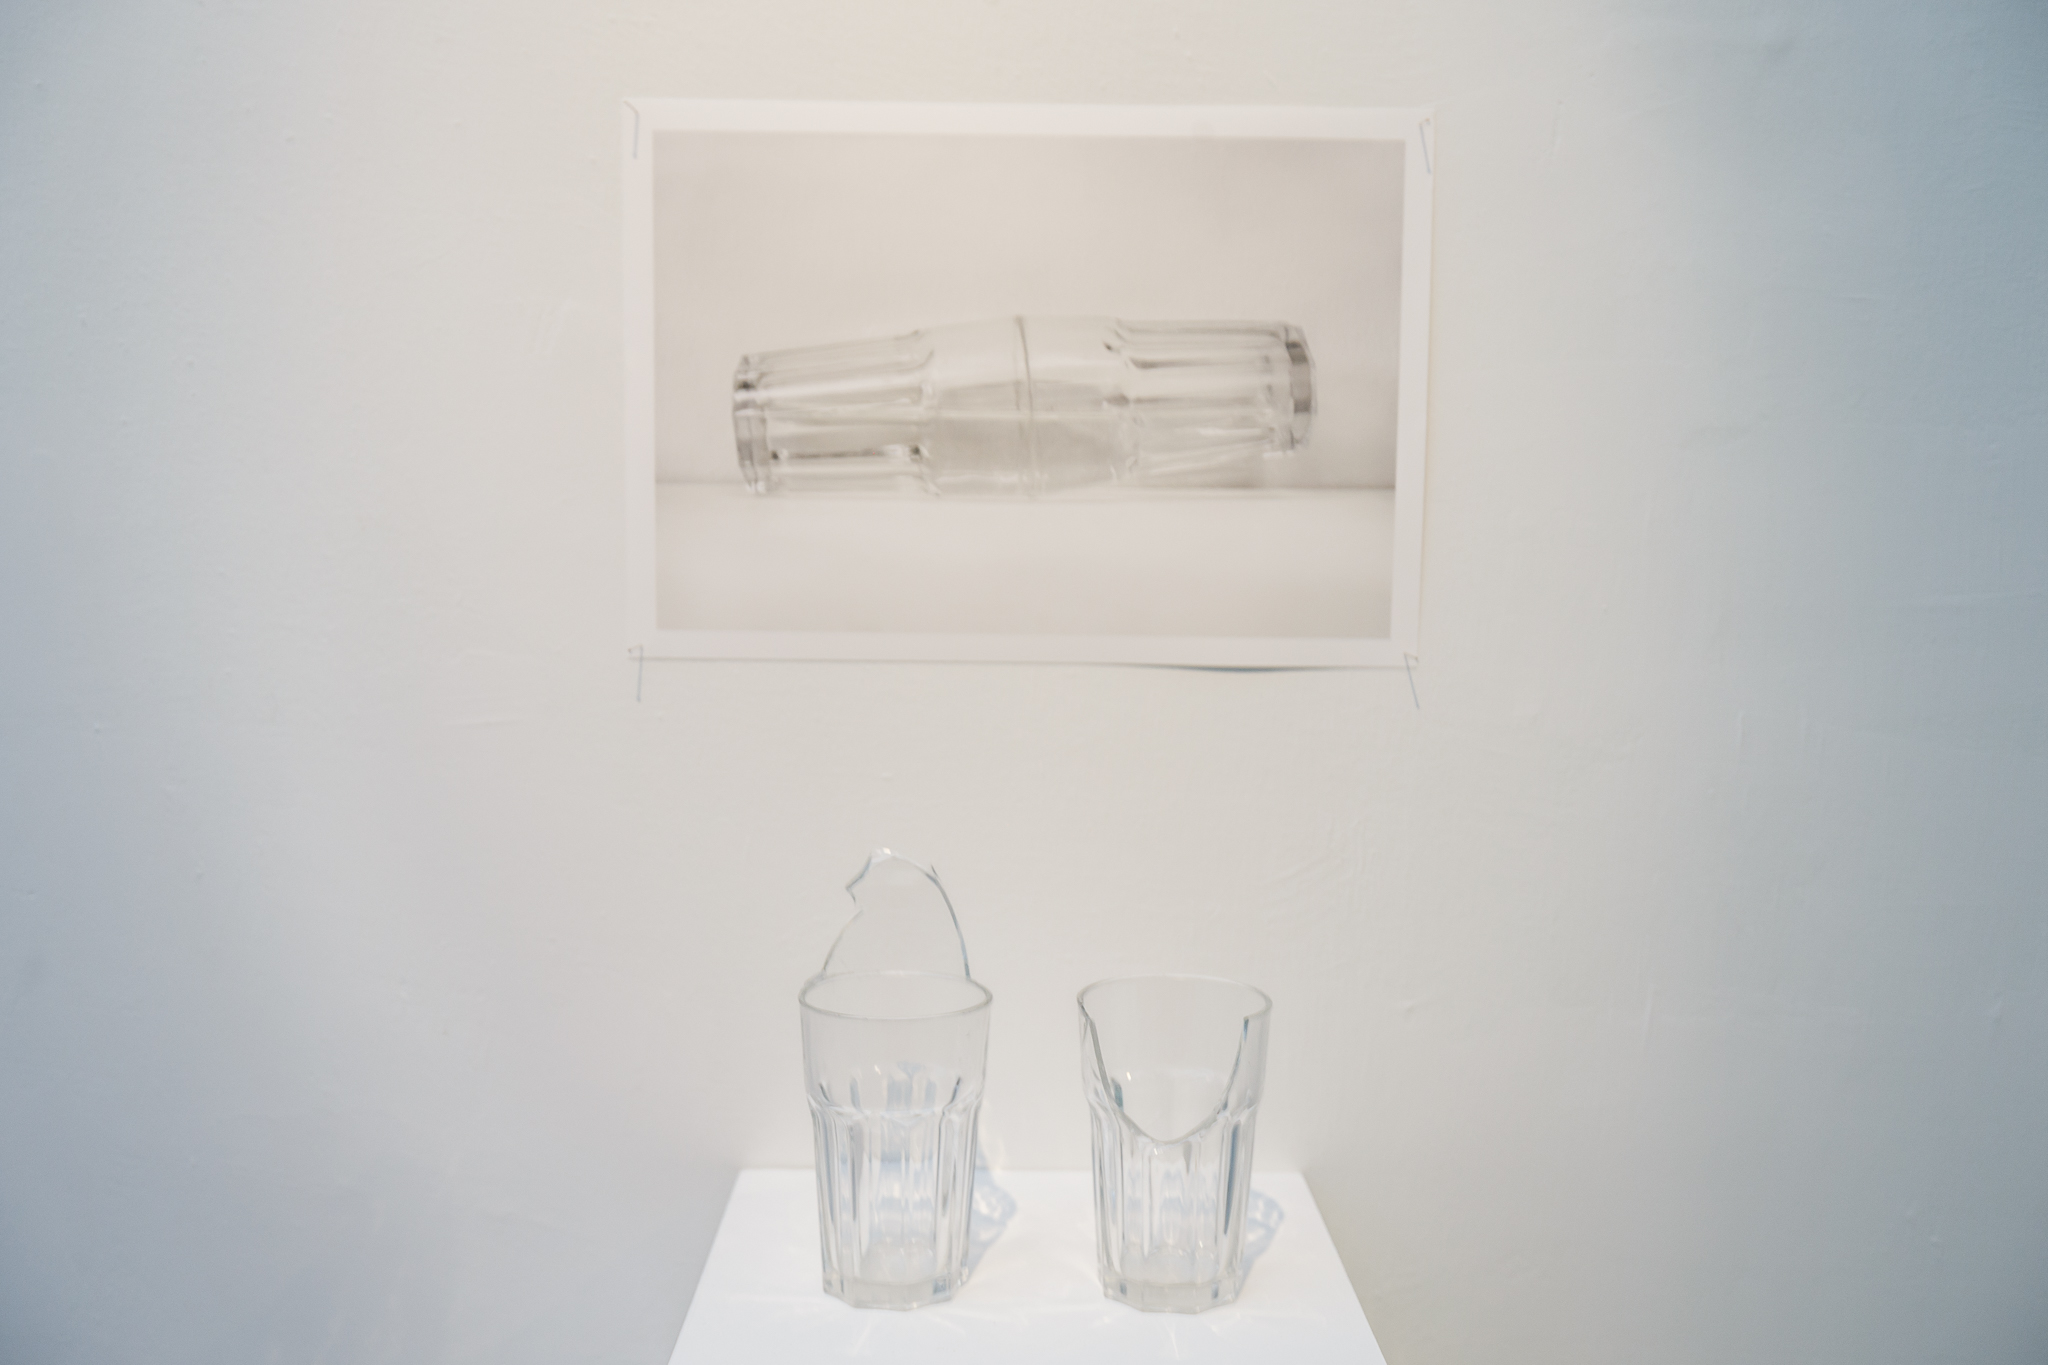 Daniel Chong, A broken kiss, 2018, Broken glass cups and glue adhesive